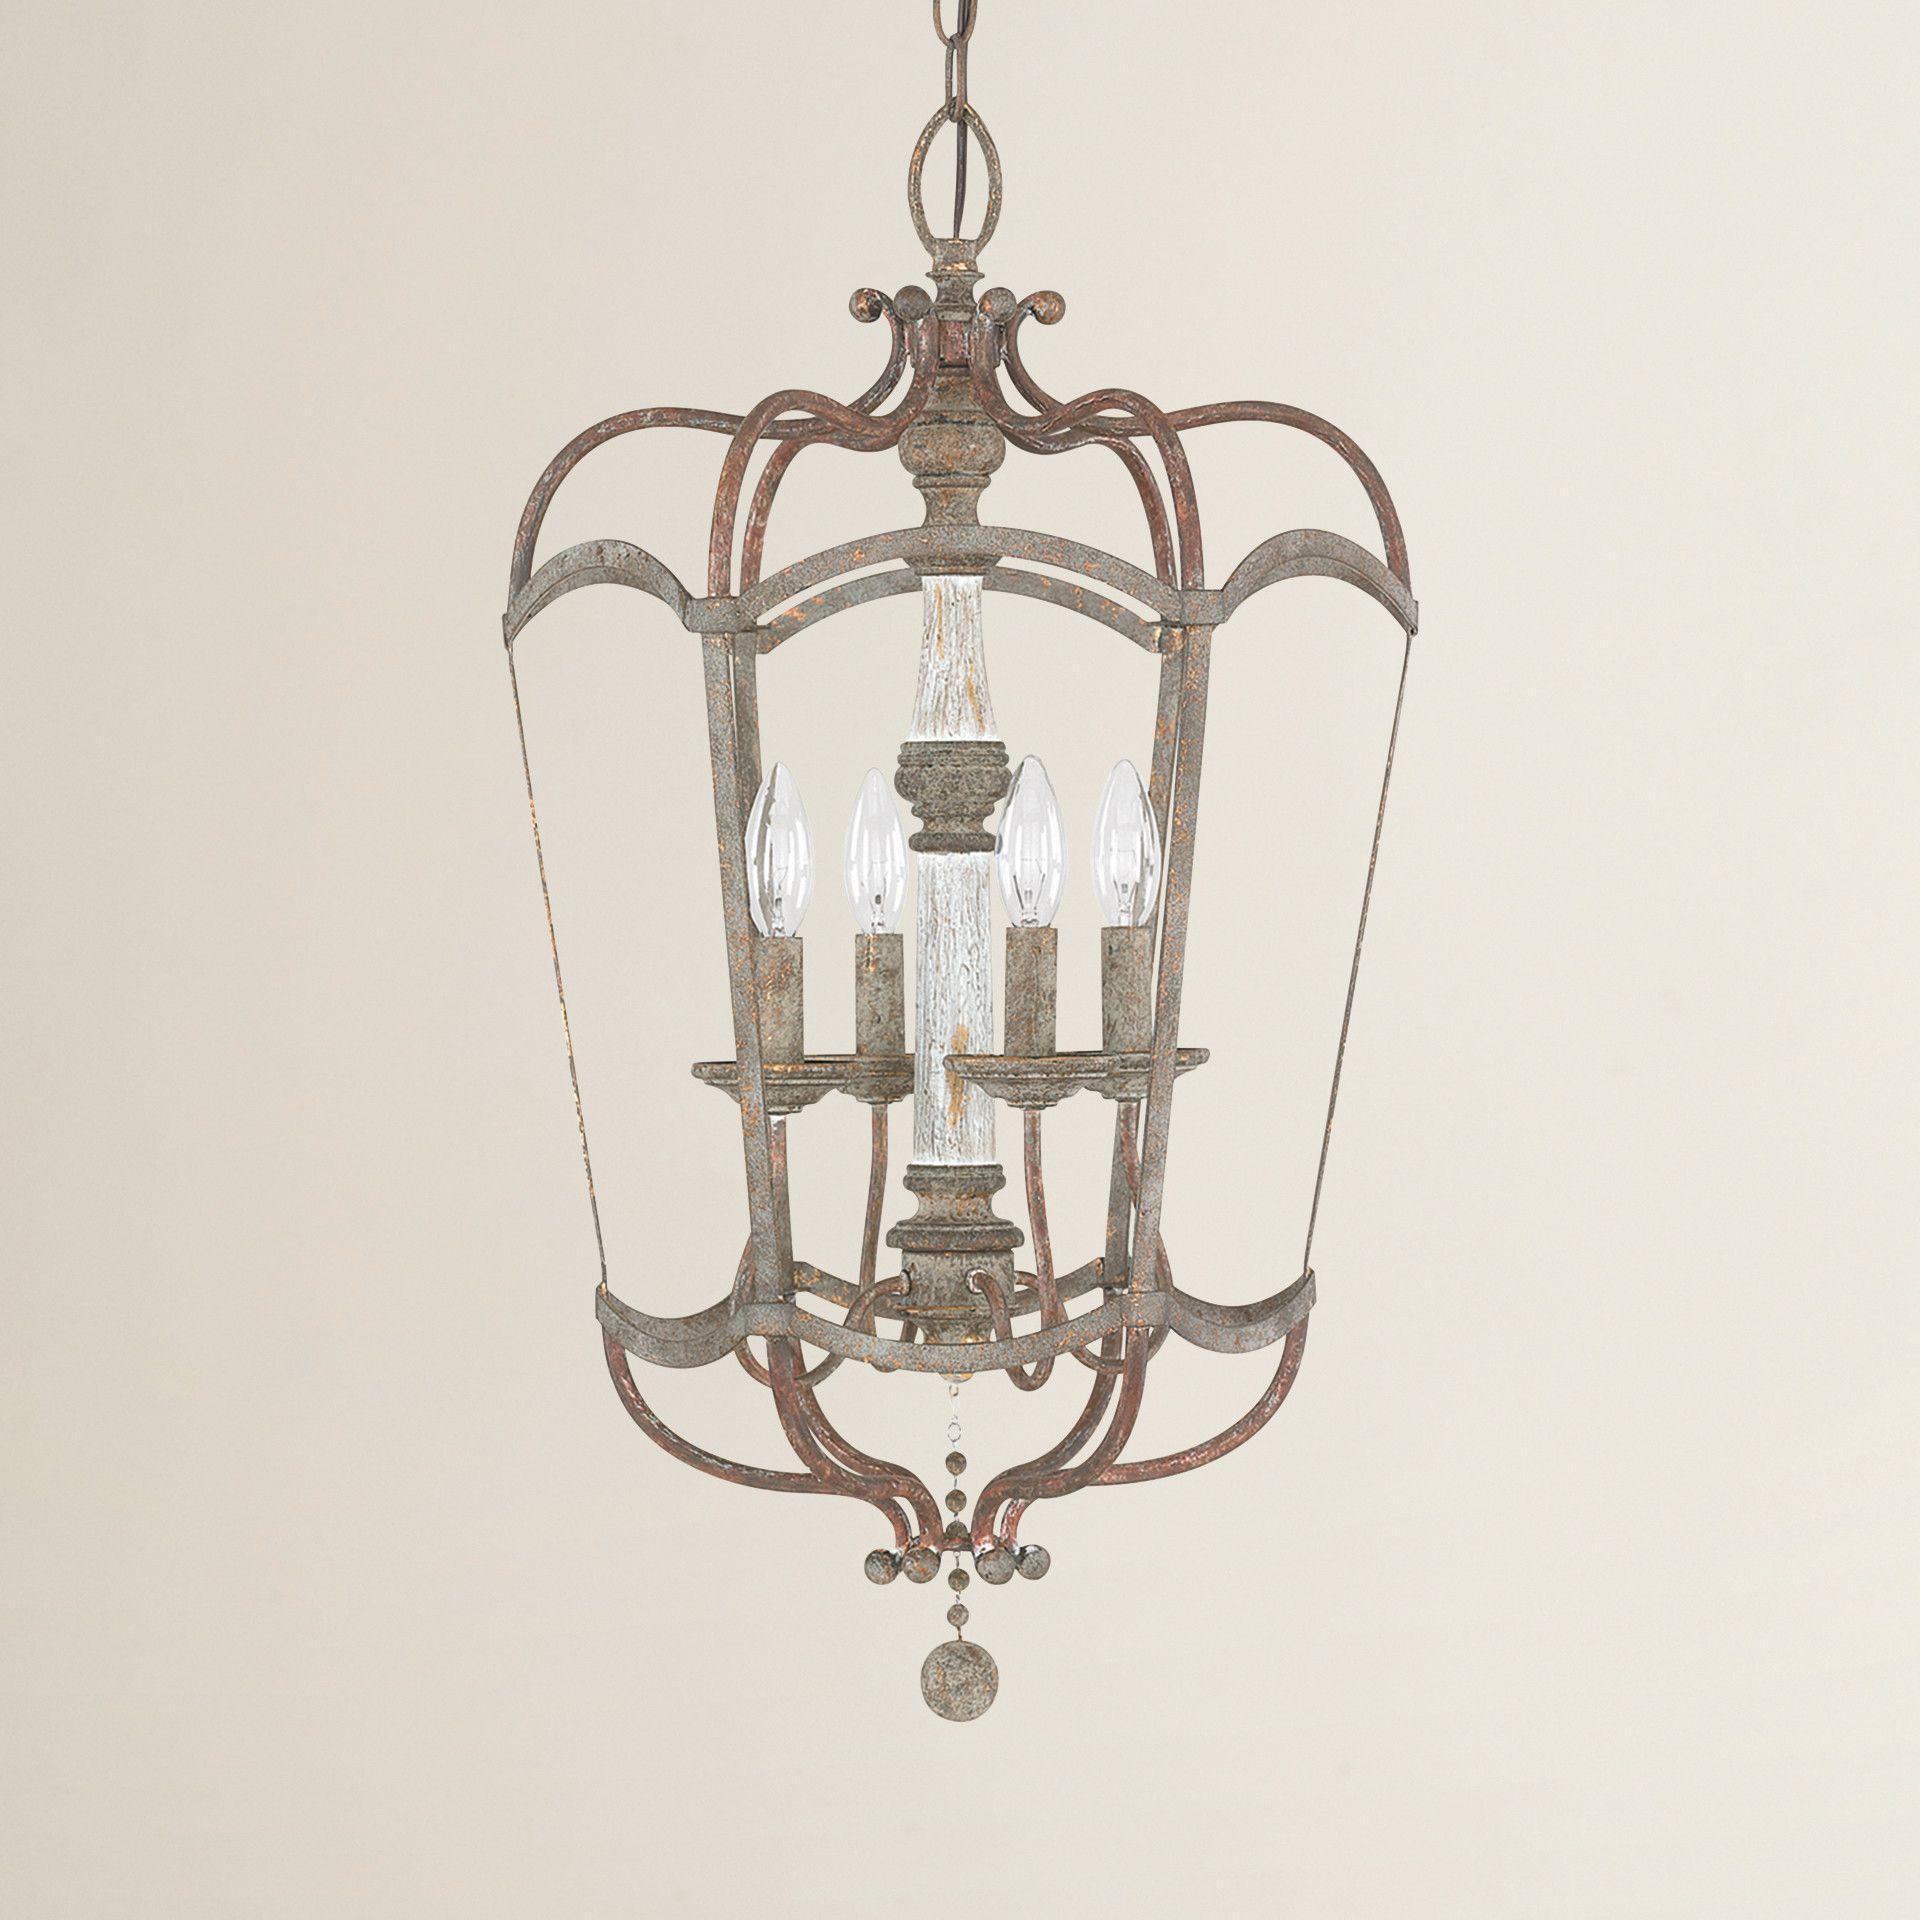 Amazon Com Progress Lighting P3701 09 1 Light Bay Court: Lark Manor Amelia 4-Light Foyer Pendant